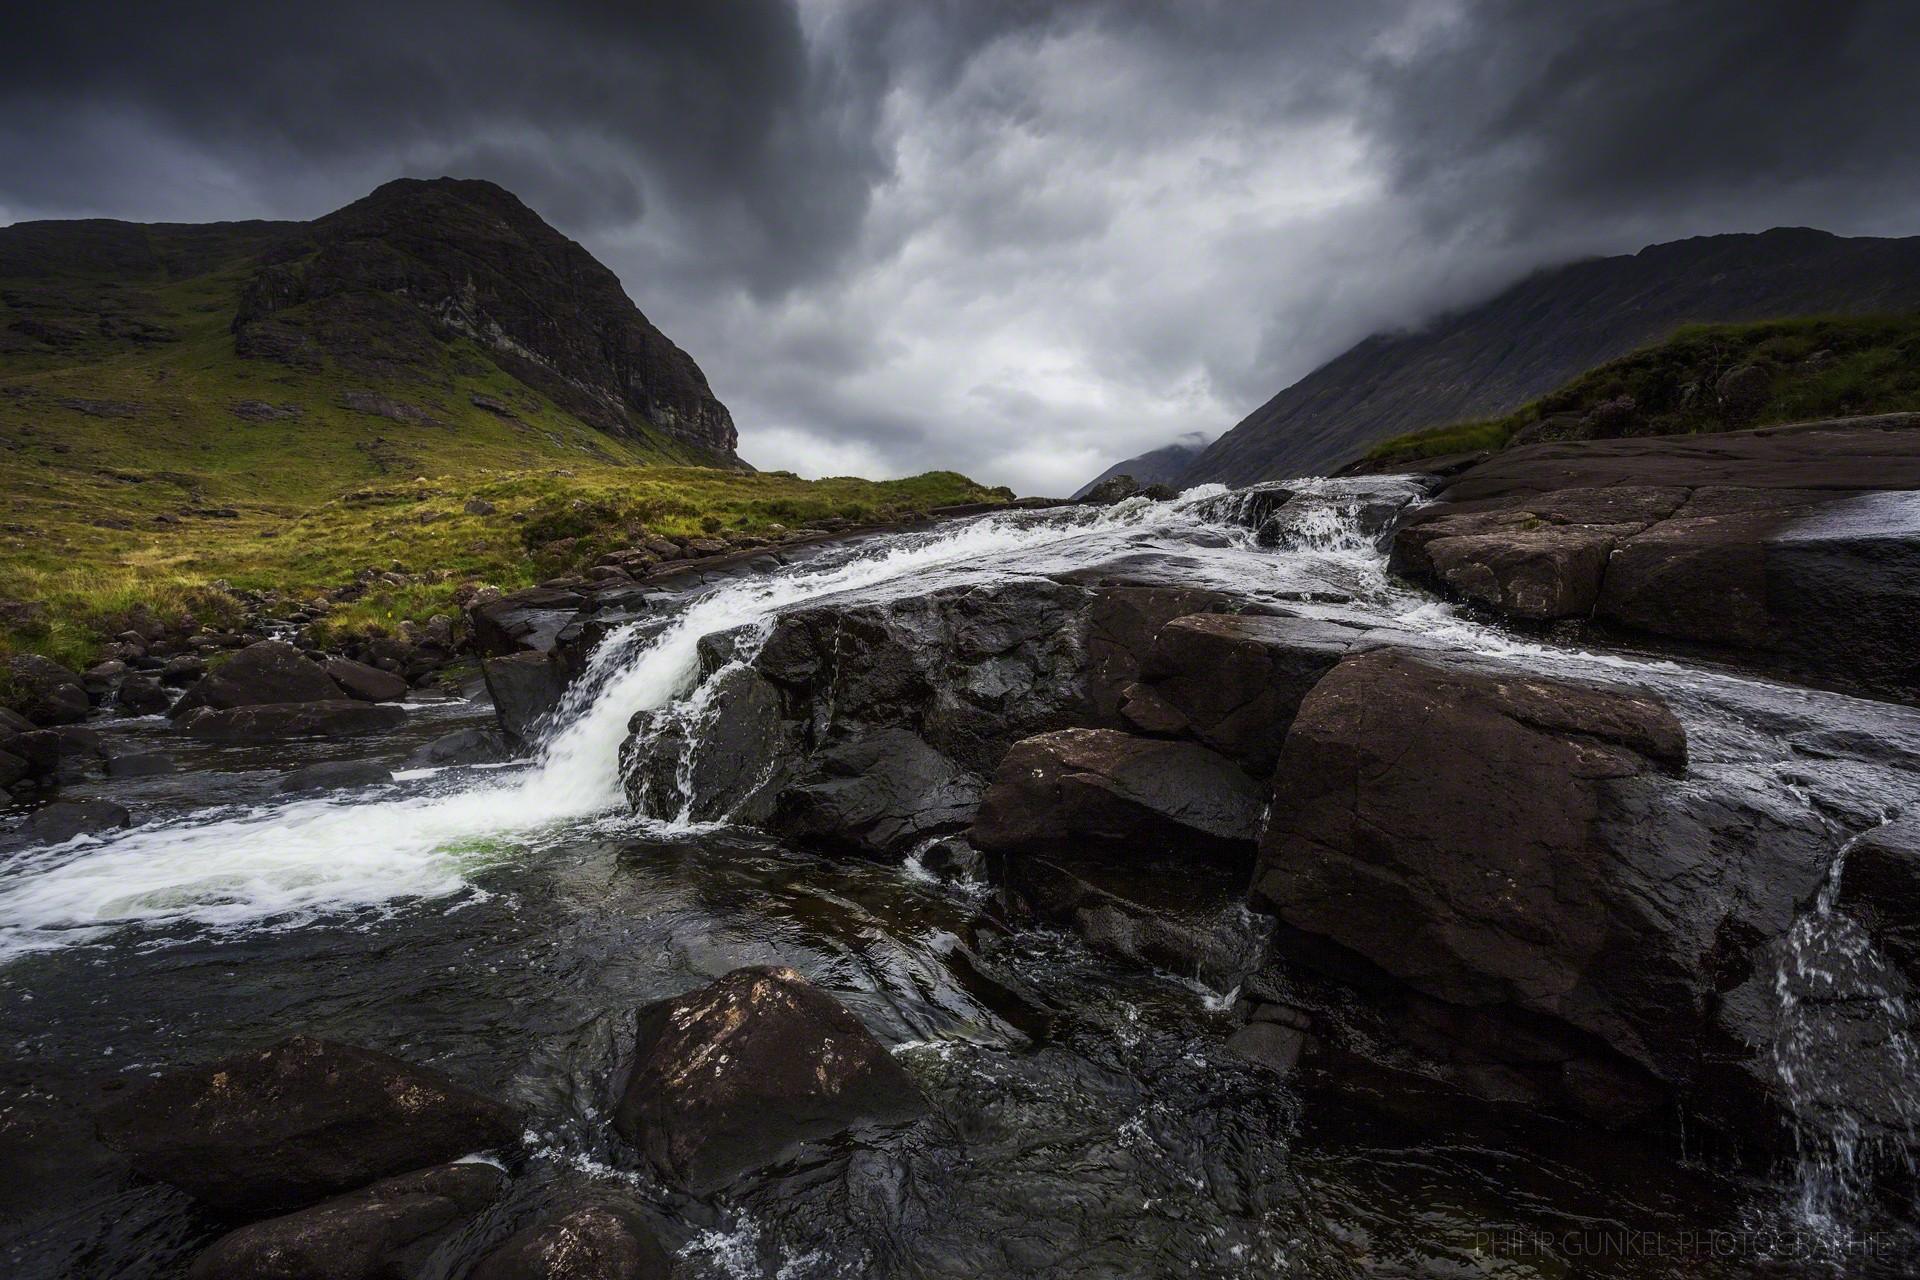 scotland_philip_gunkel_photographie_www.philipgunkel.de15